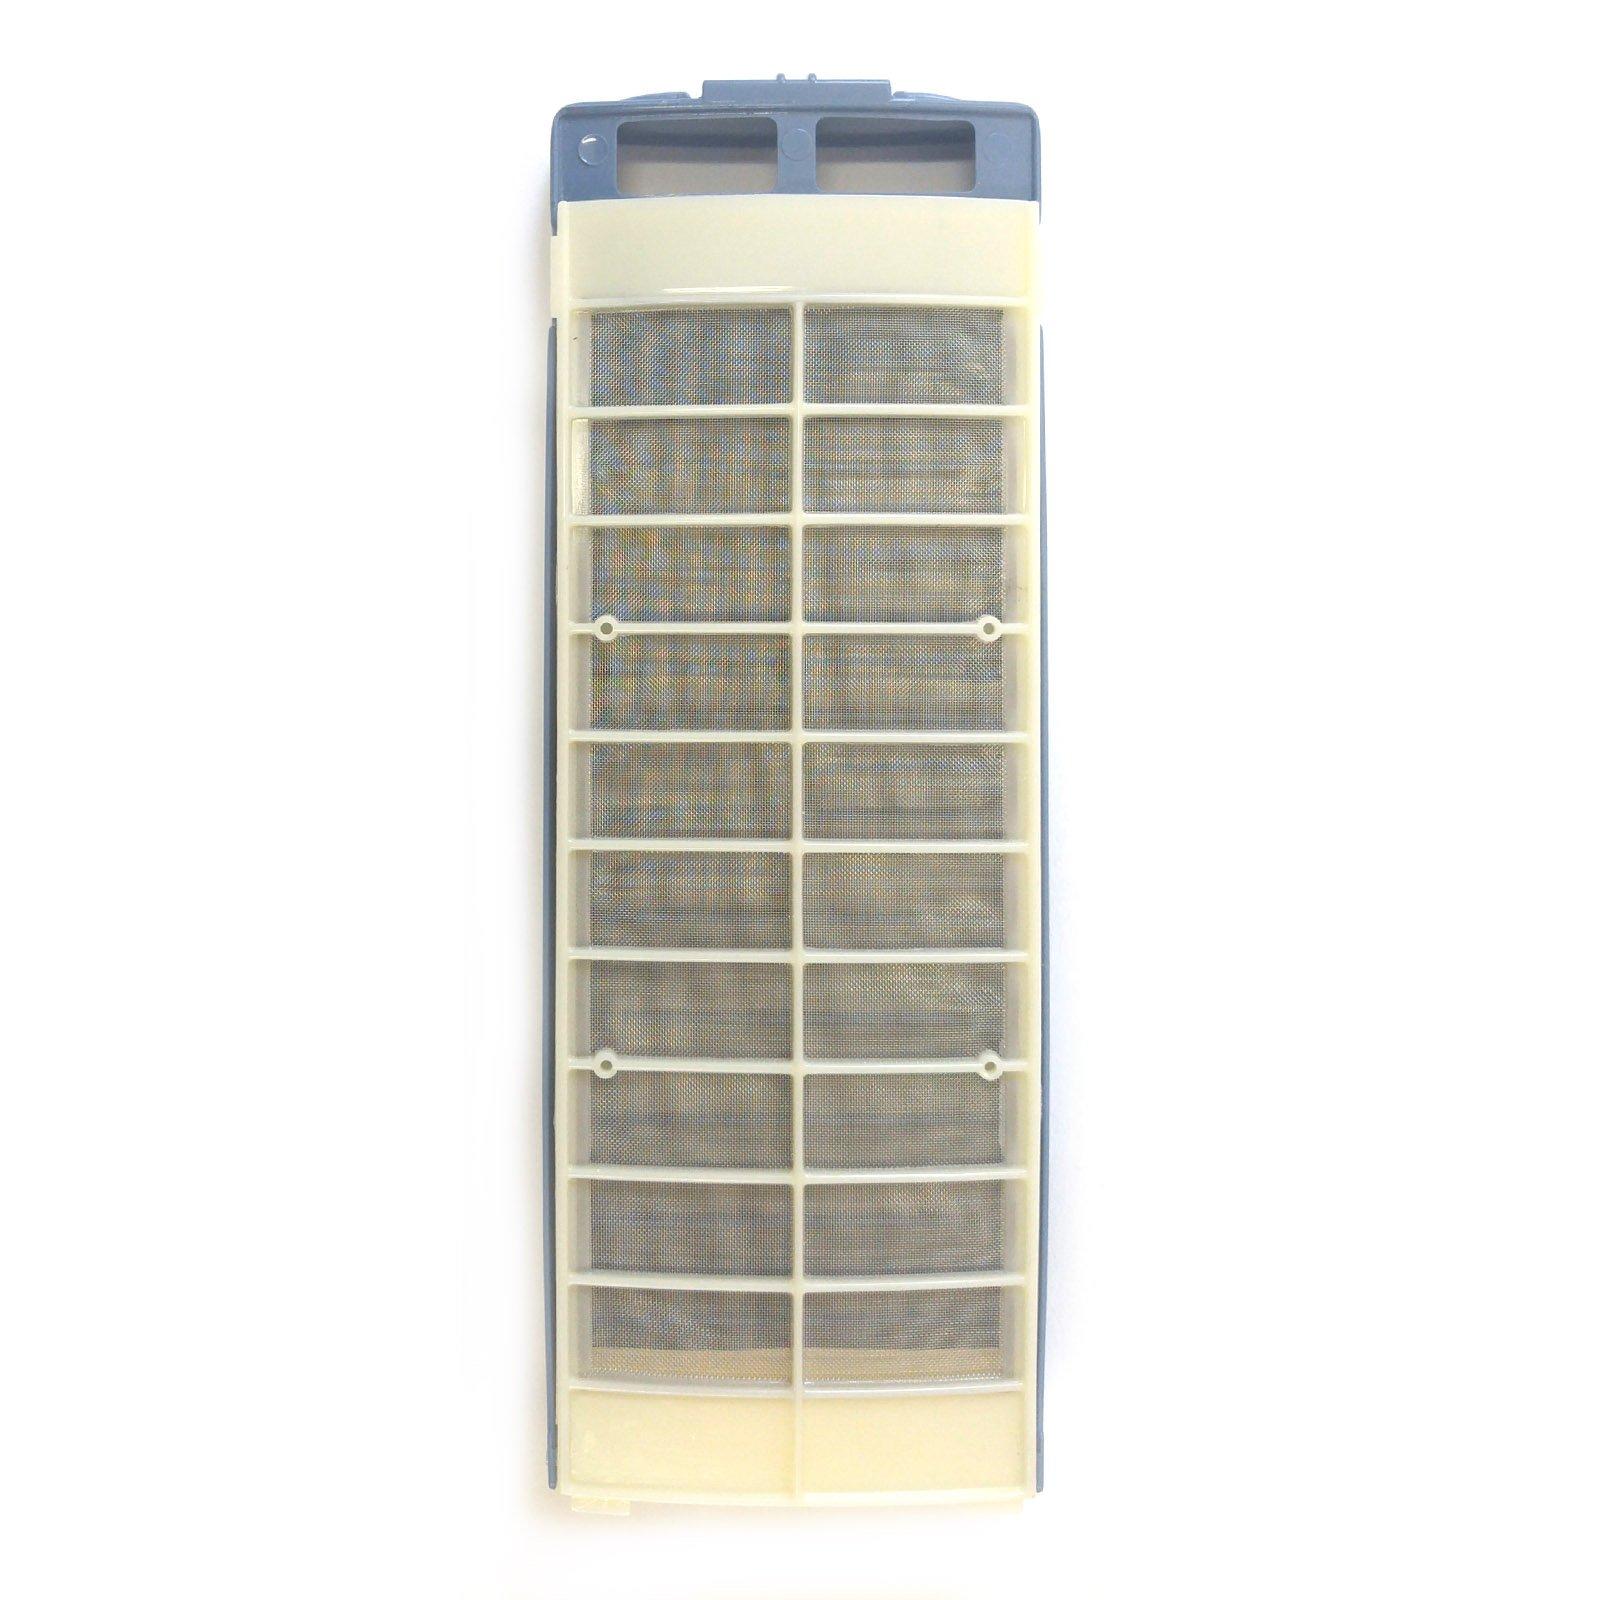 Washing Machine Lint Filter For Samsung WA90H7000GW WA10H7200GW WA10J8700GW//SA